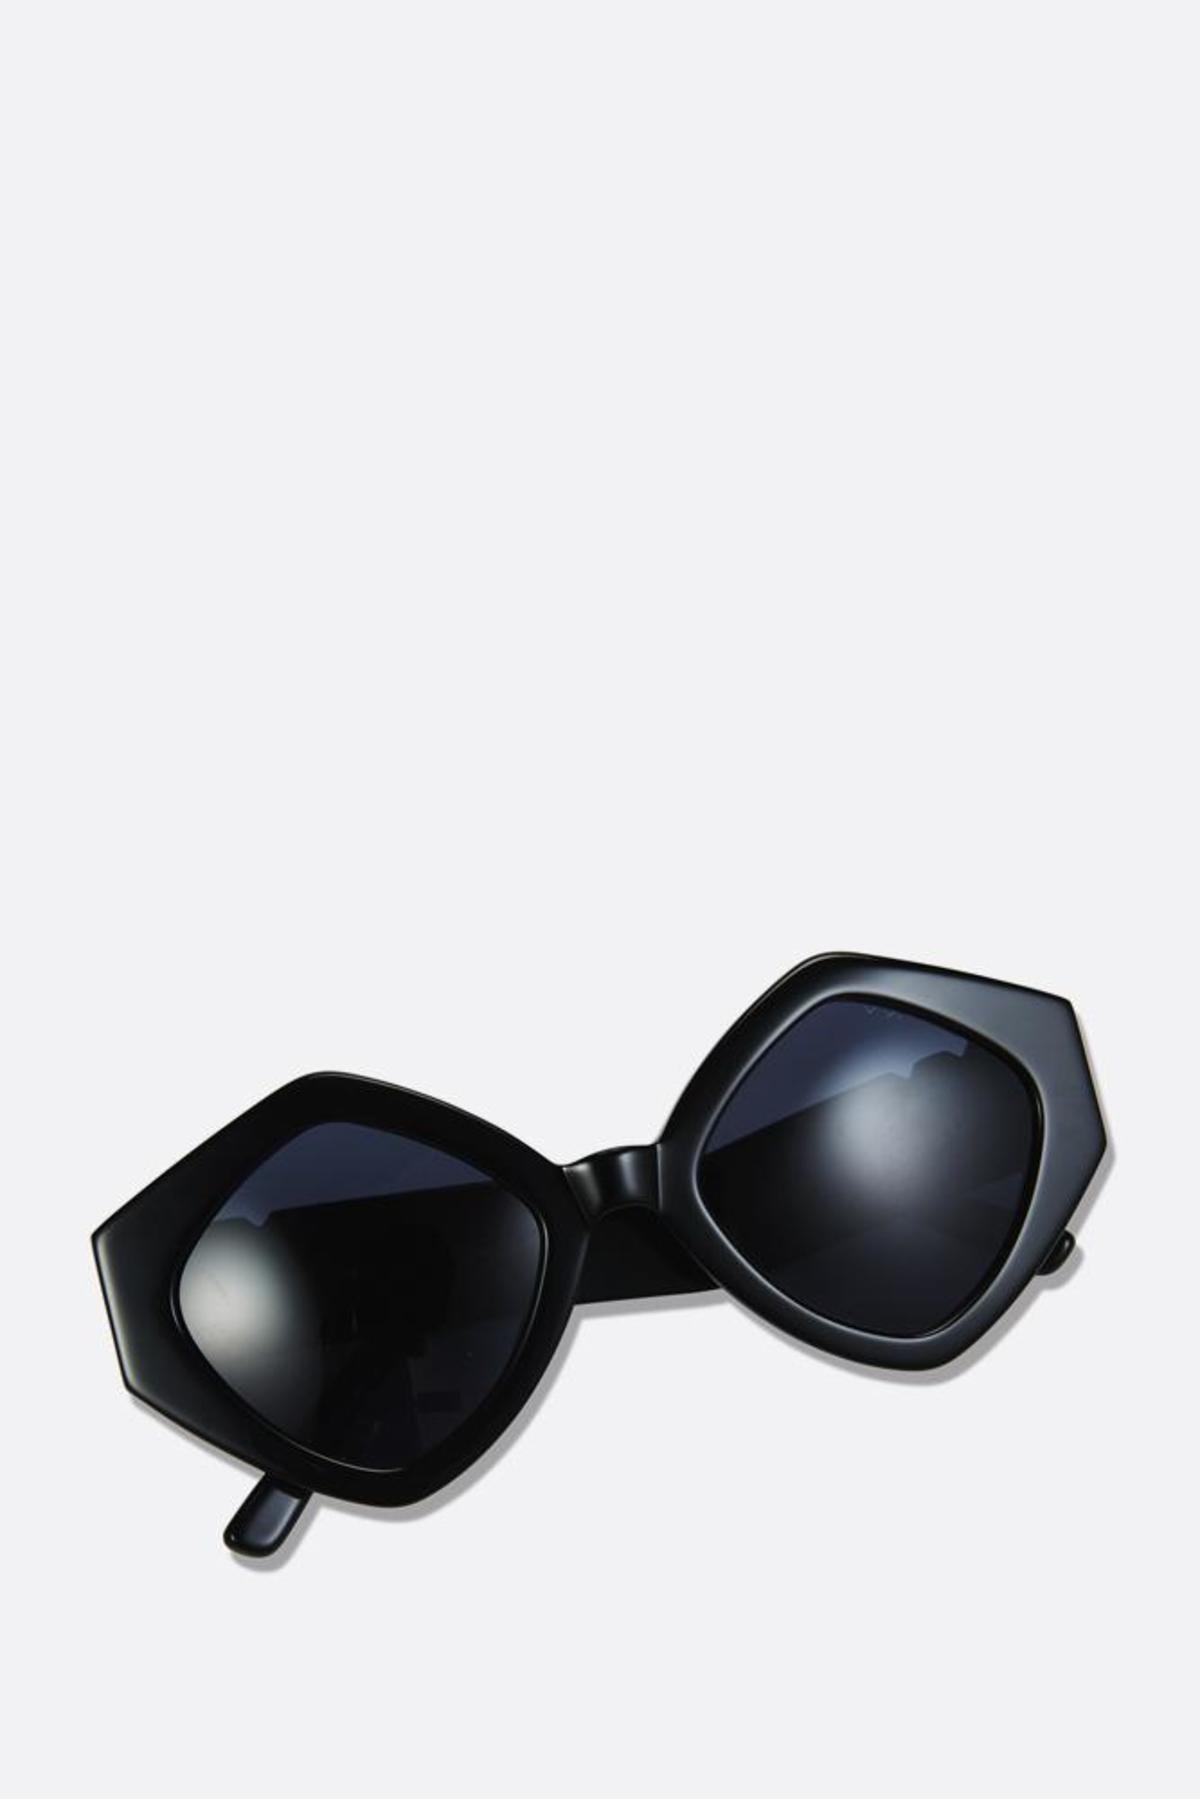 8b7af679d9 Pared Romeo and Juliet Sunglasses - Black